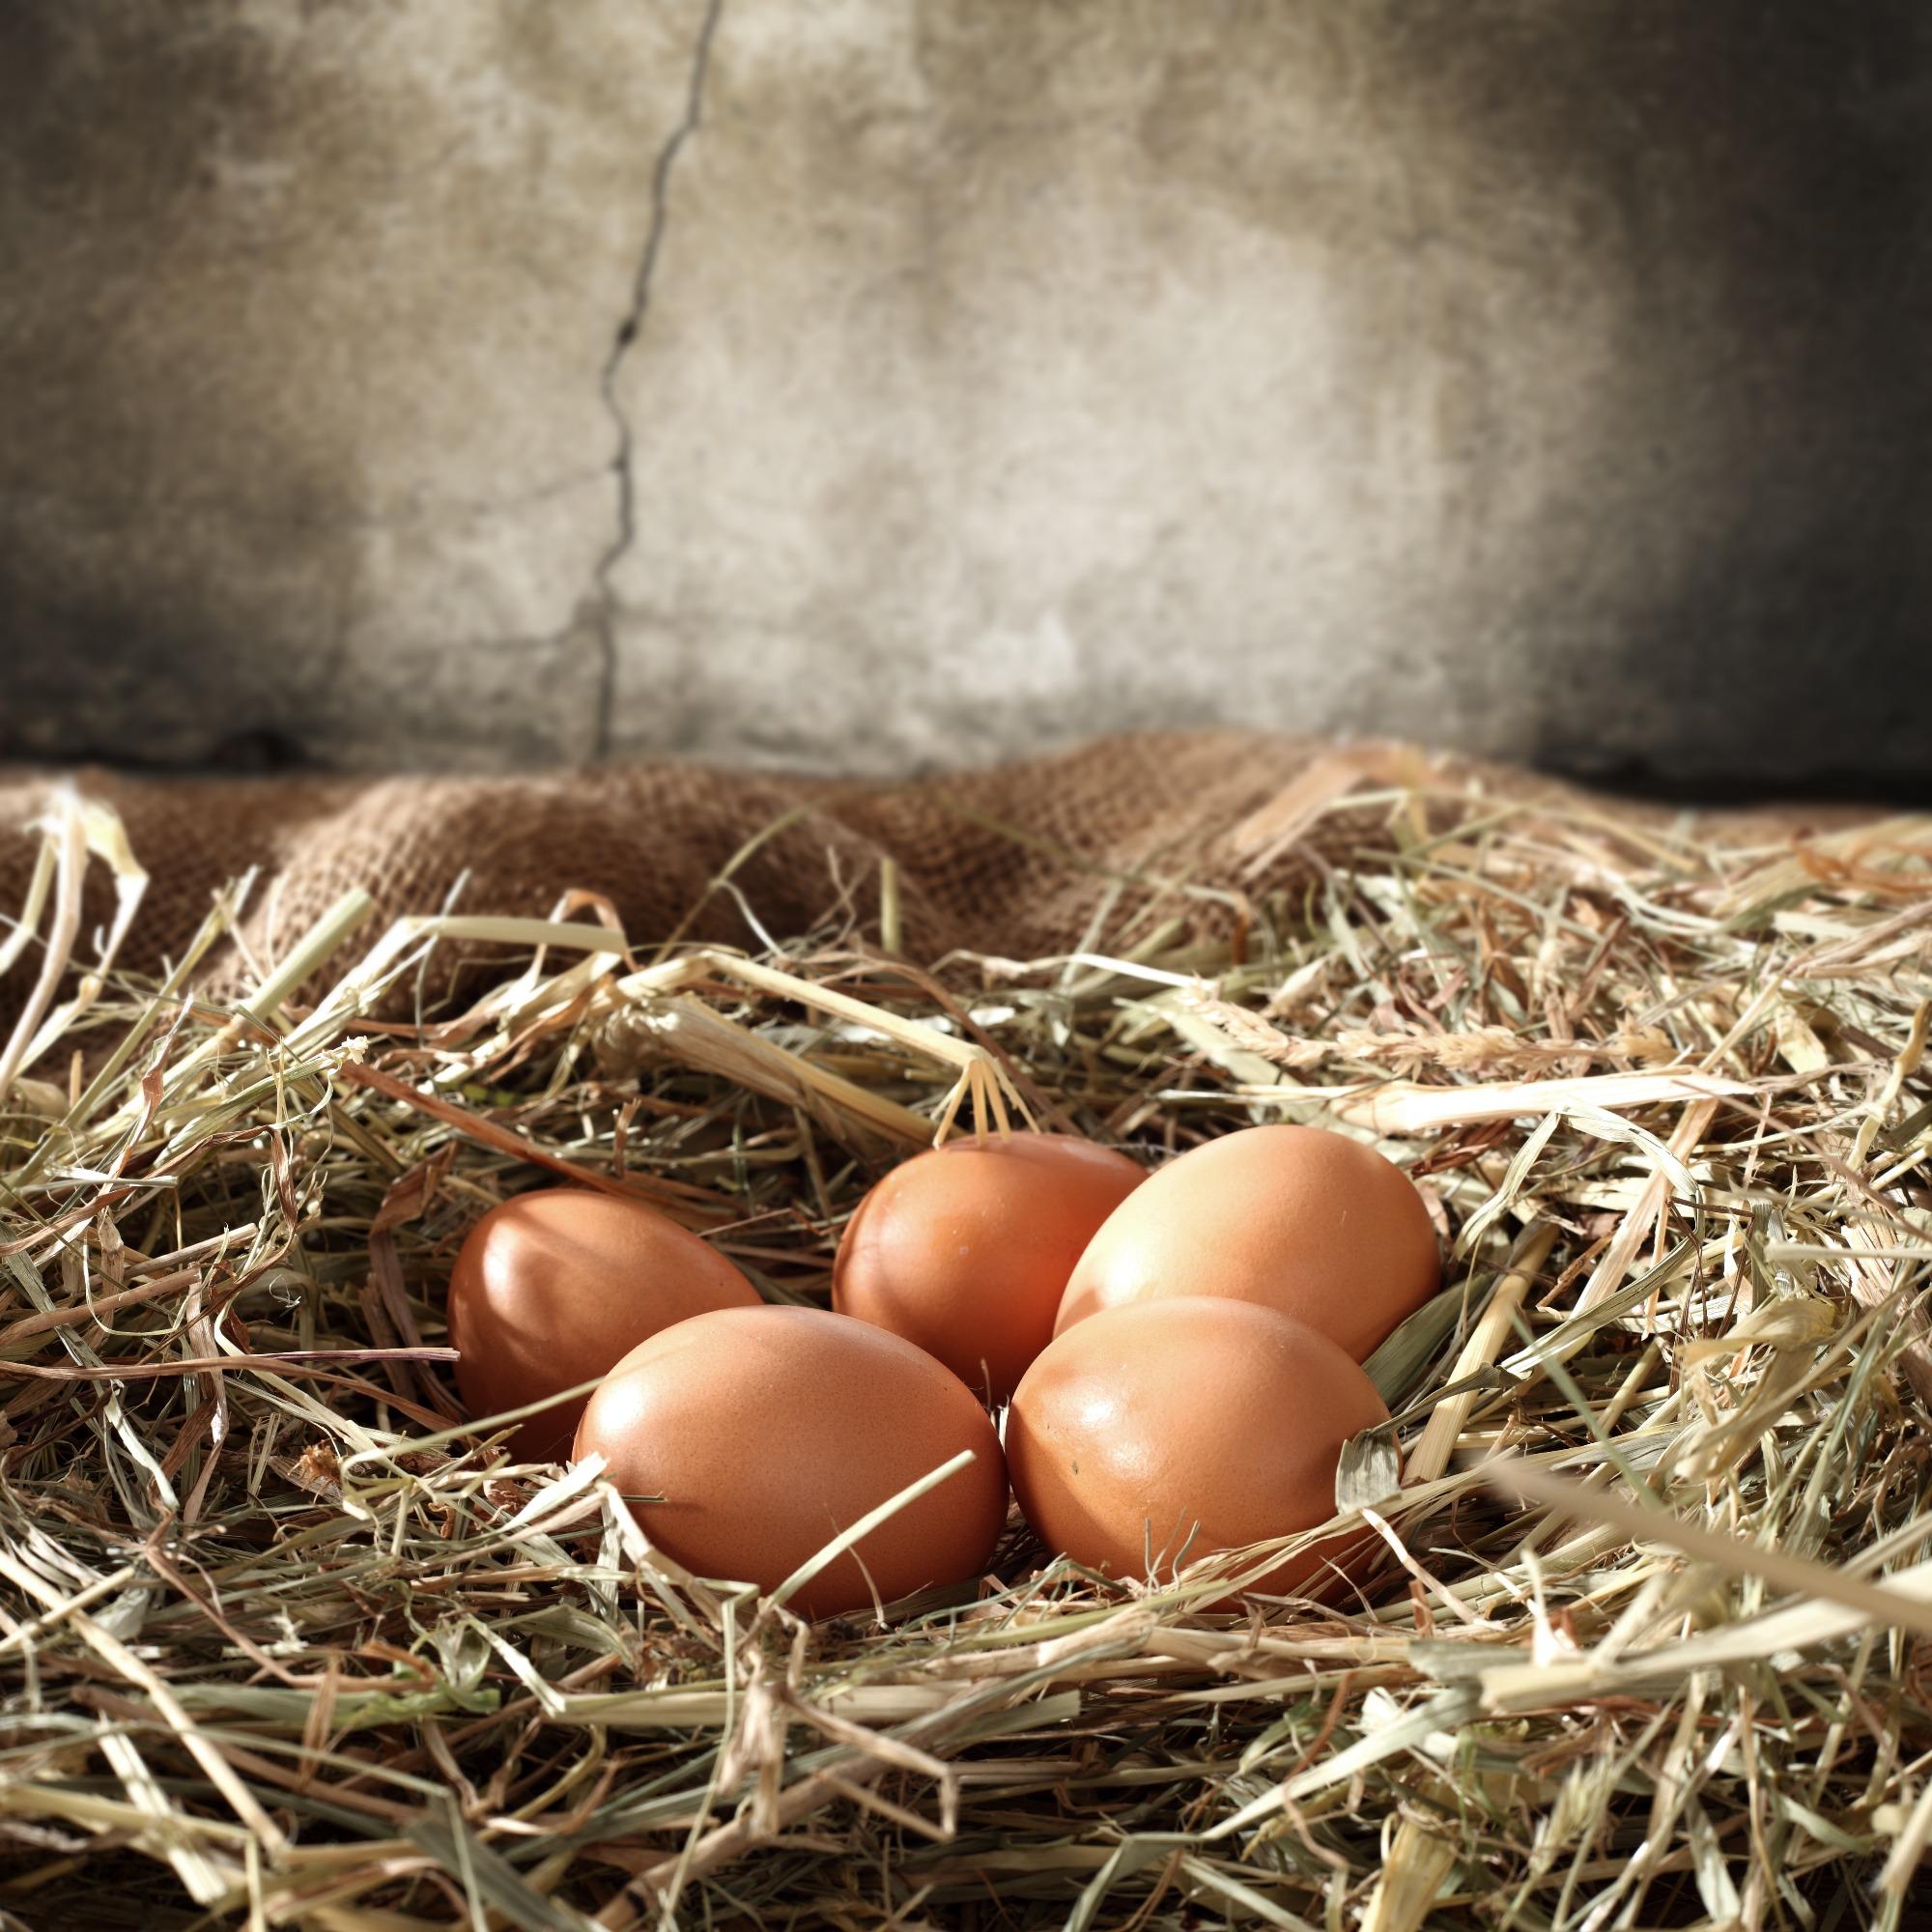 Poder de compra do avicultor de postura recua, aponta Cepea